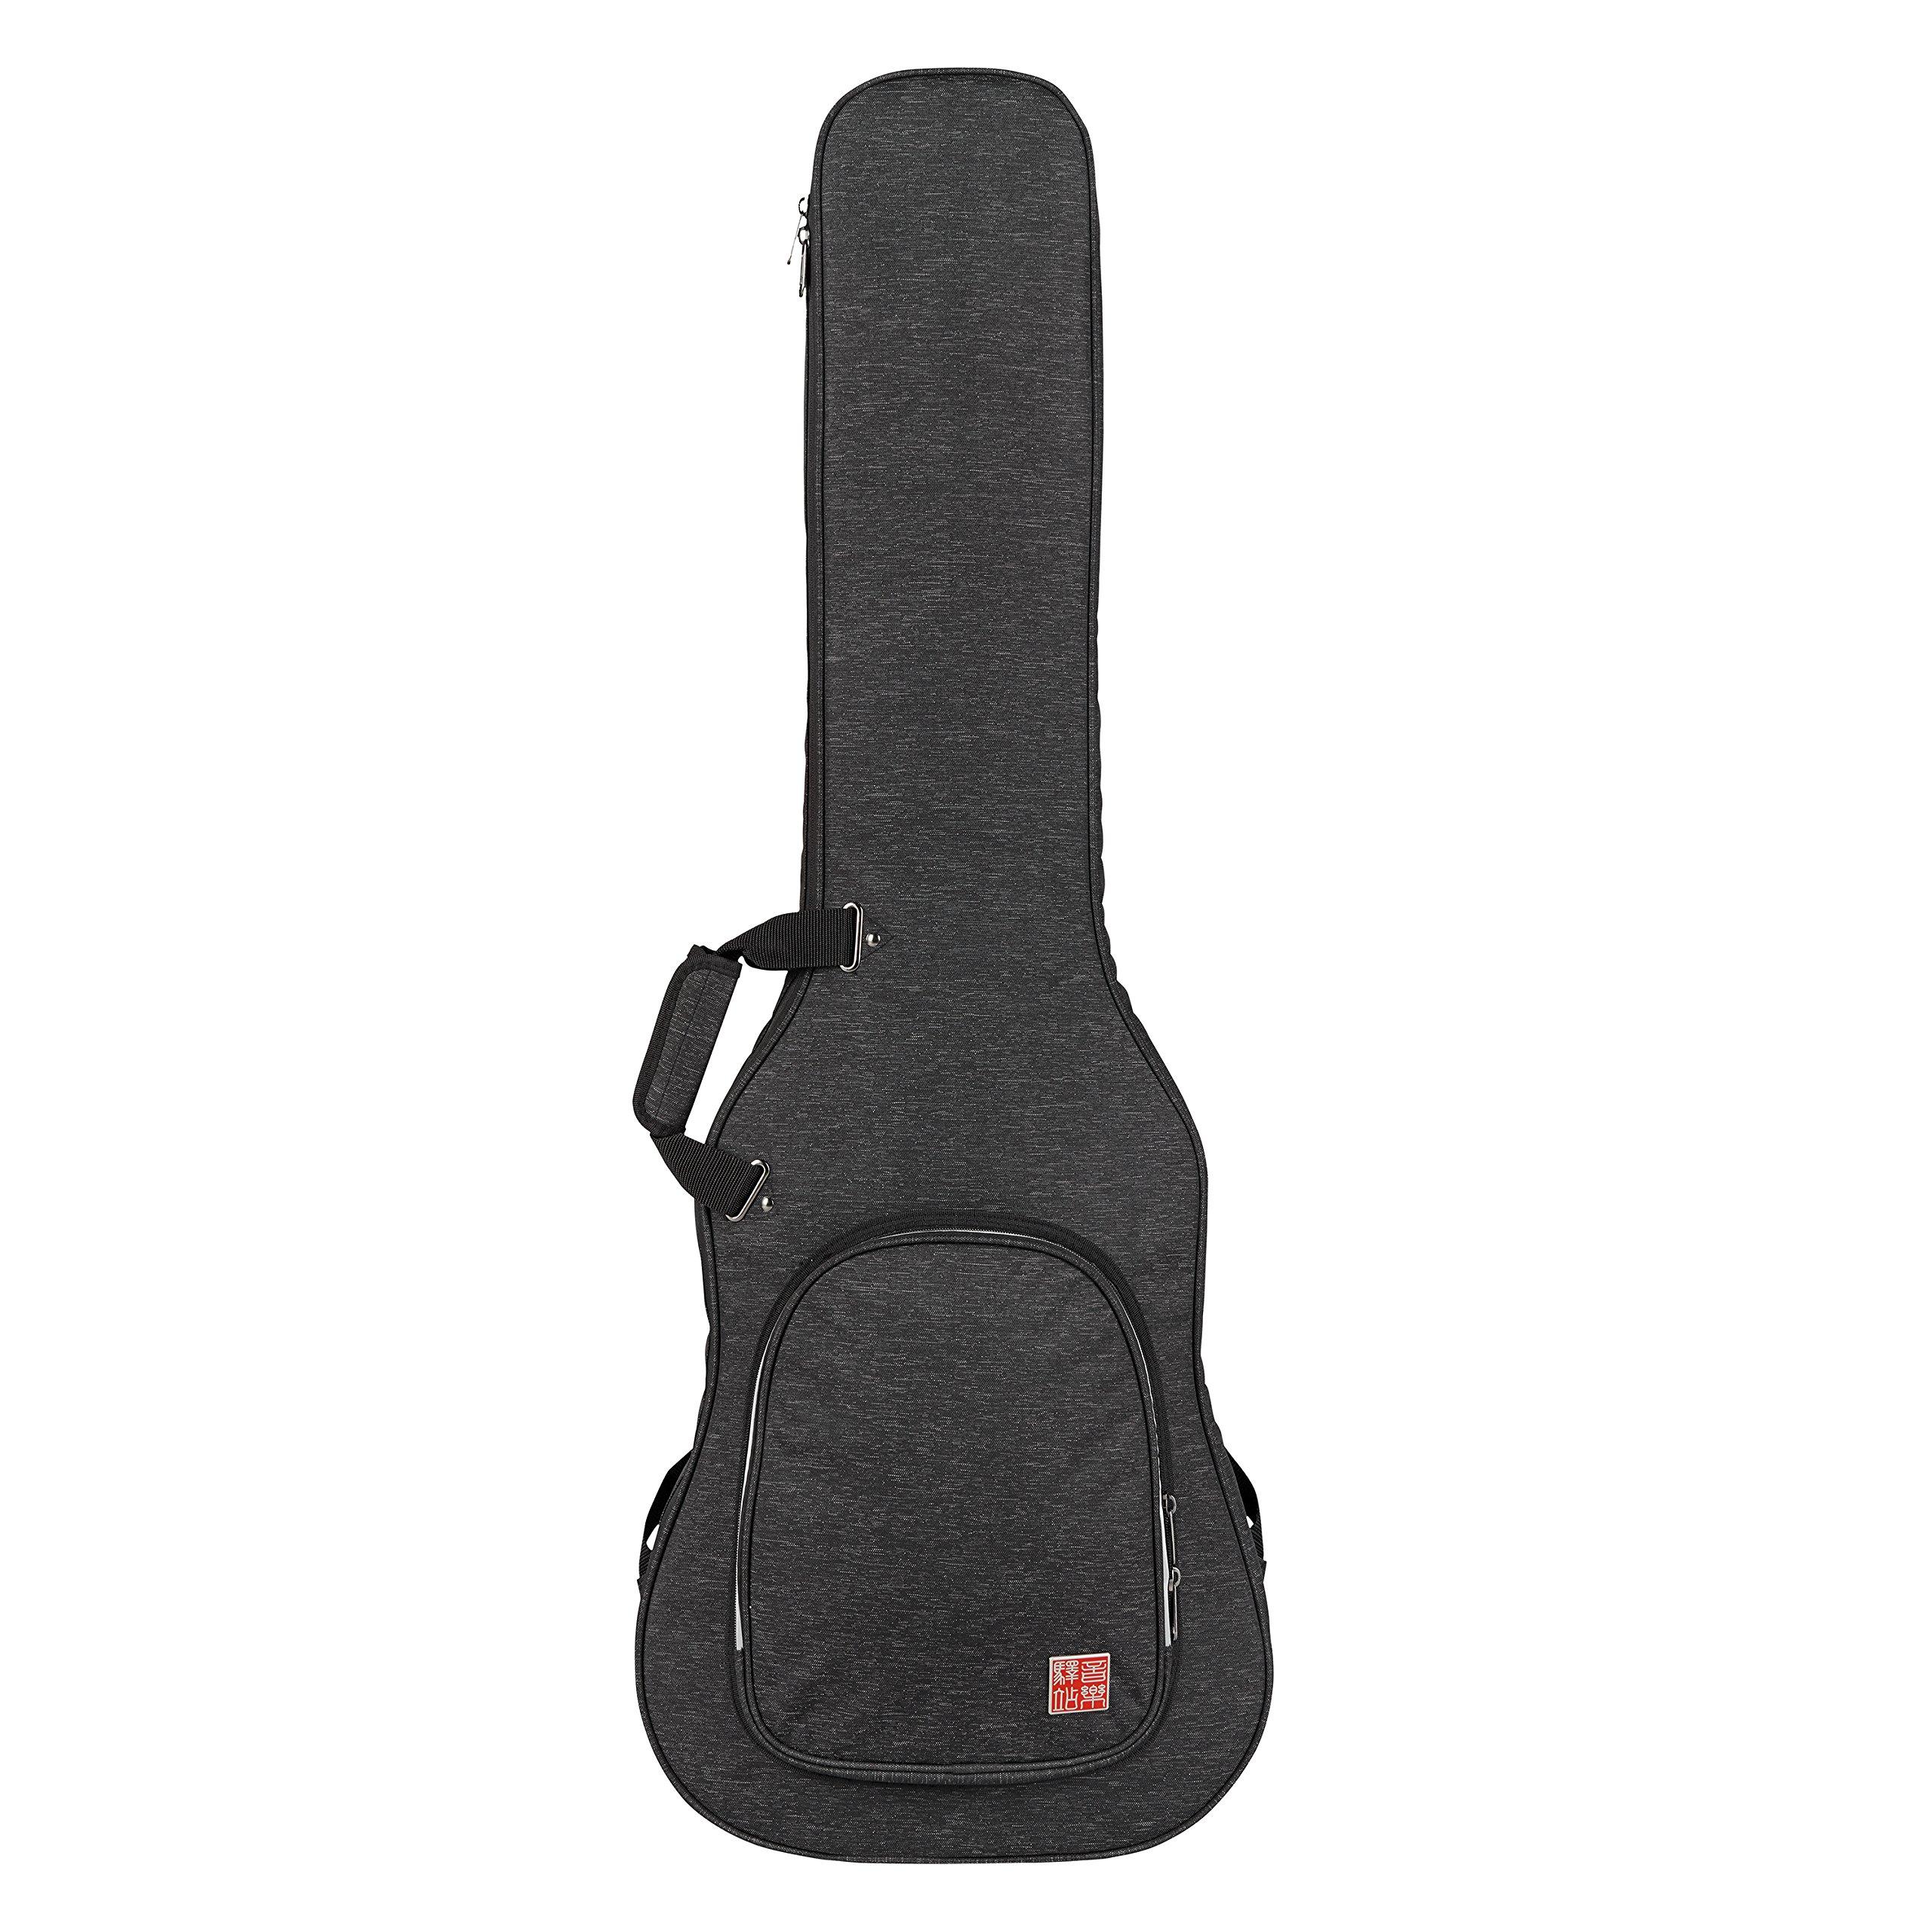 Music Area RB20-EB-BLK Series Bass Guitar Bag, Black